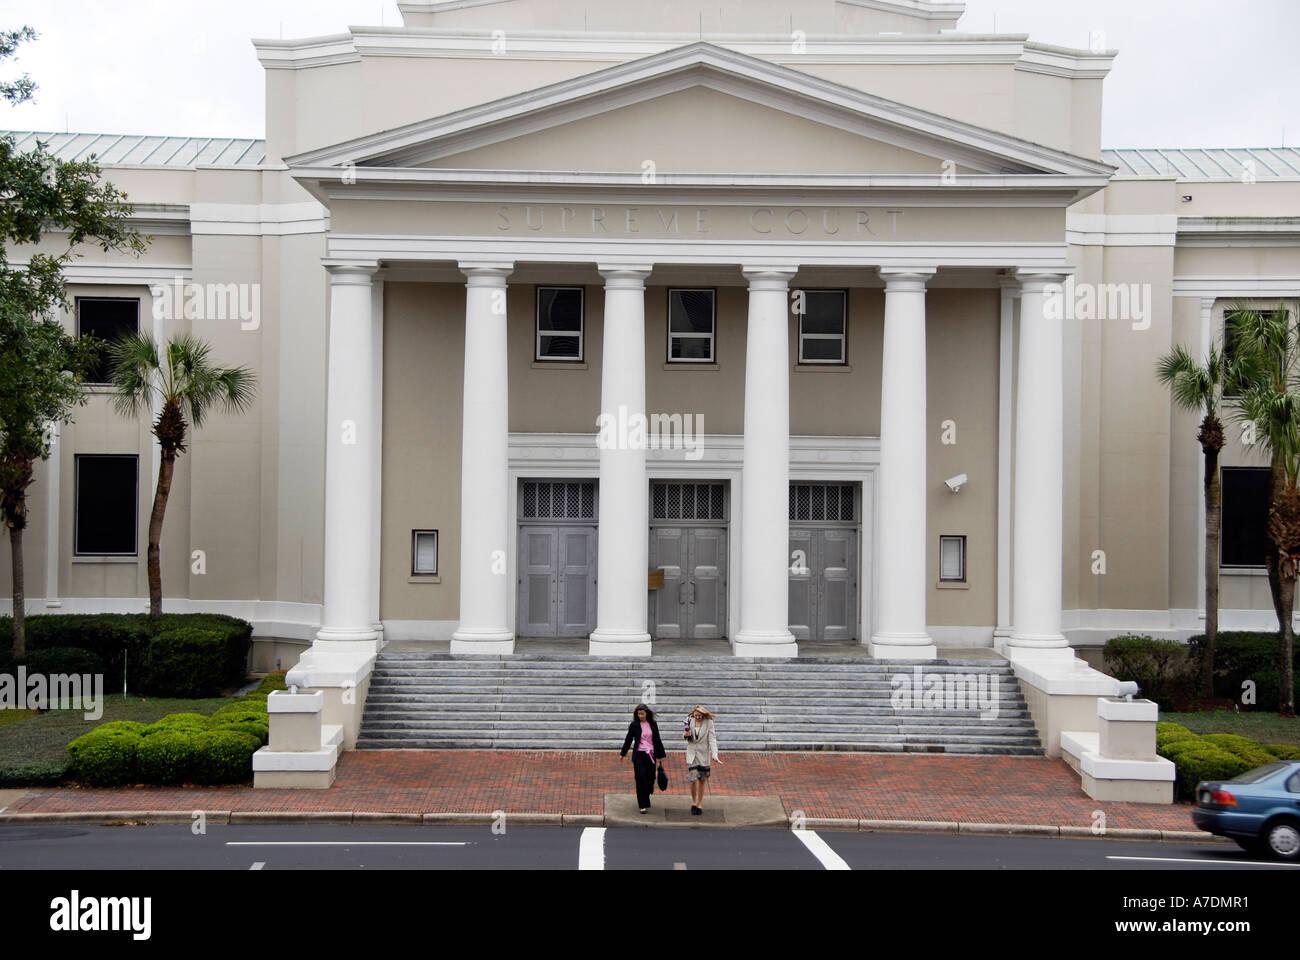 Florida Supreme Court Stock Photos & Florida Supreme Court